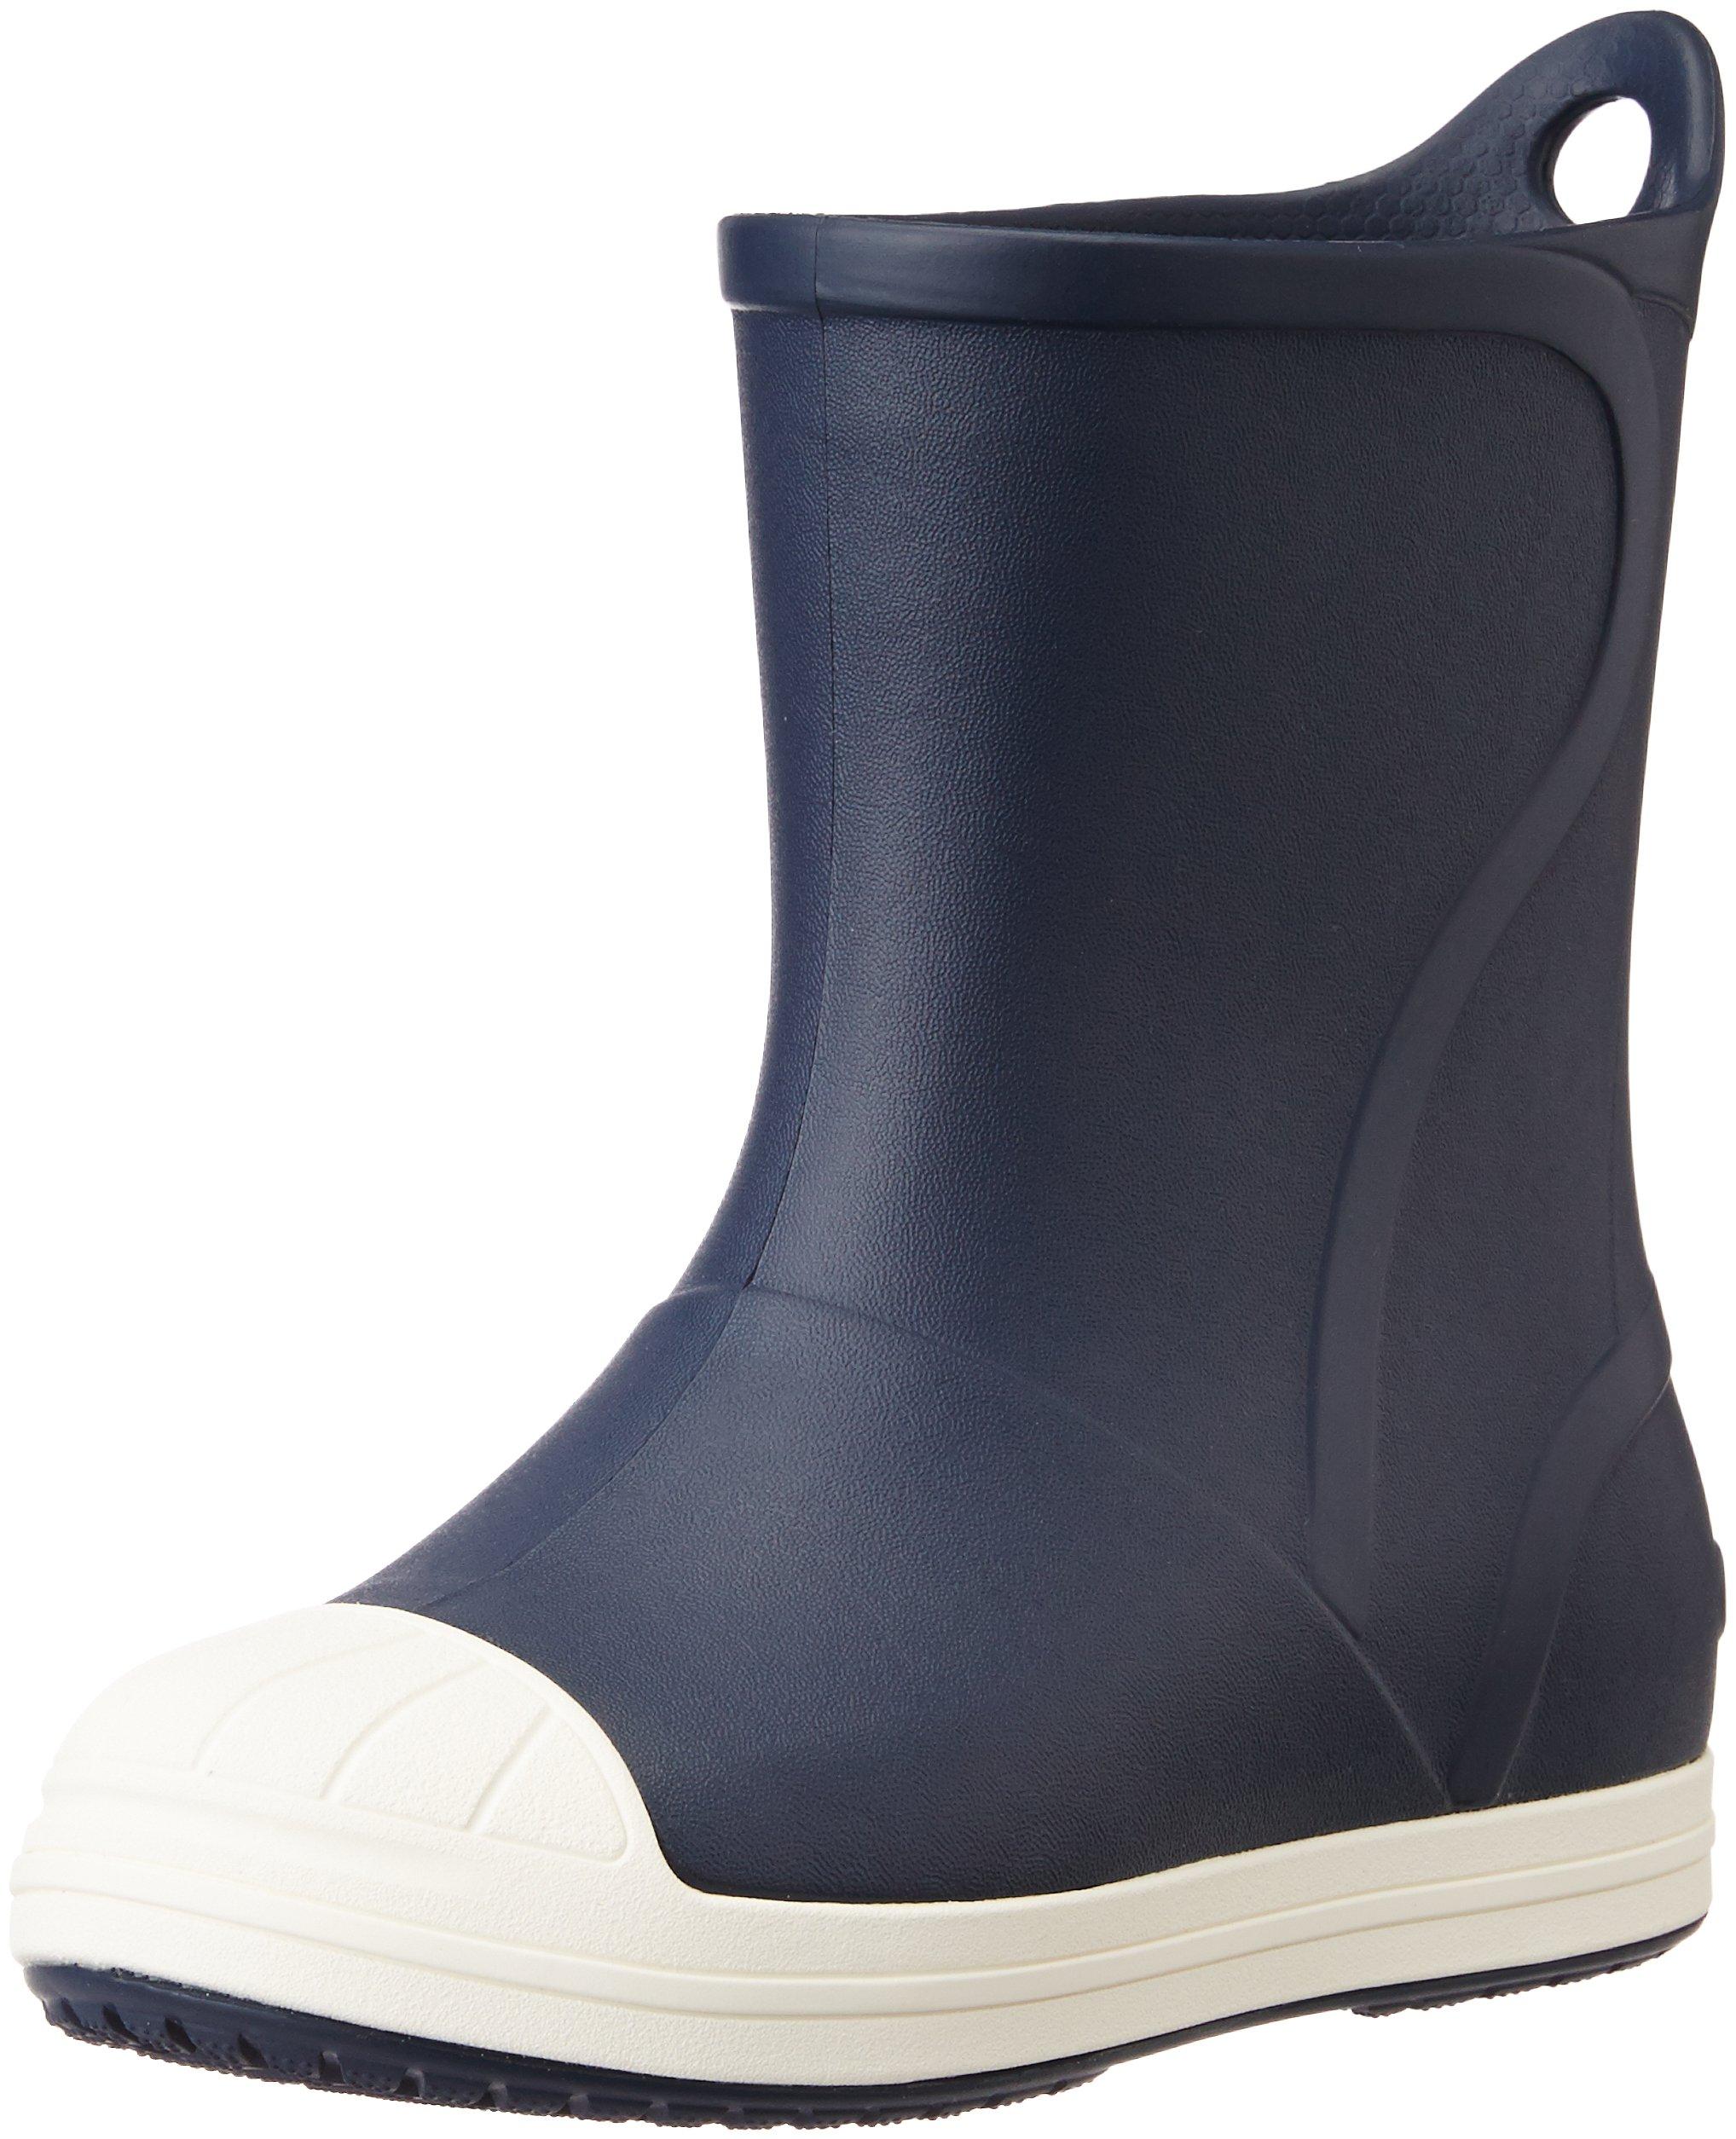 Crocs Bump It Rain Boot, Navy/Oyster, 8 M US Toddler